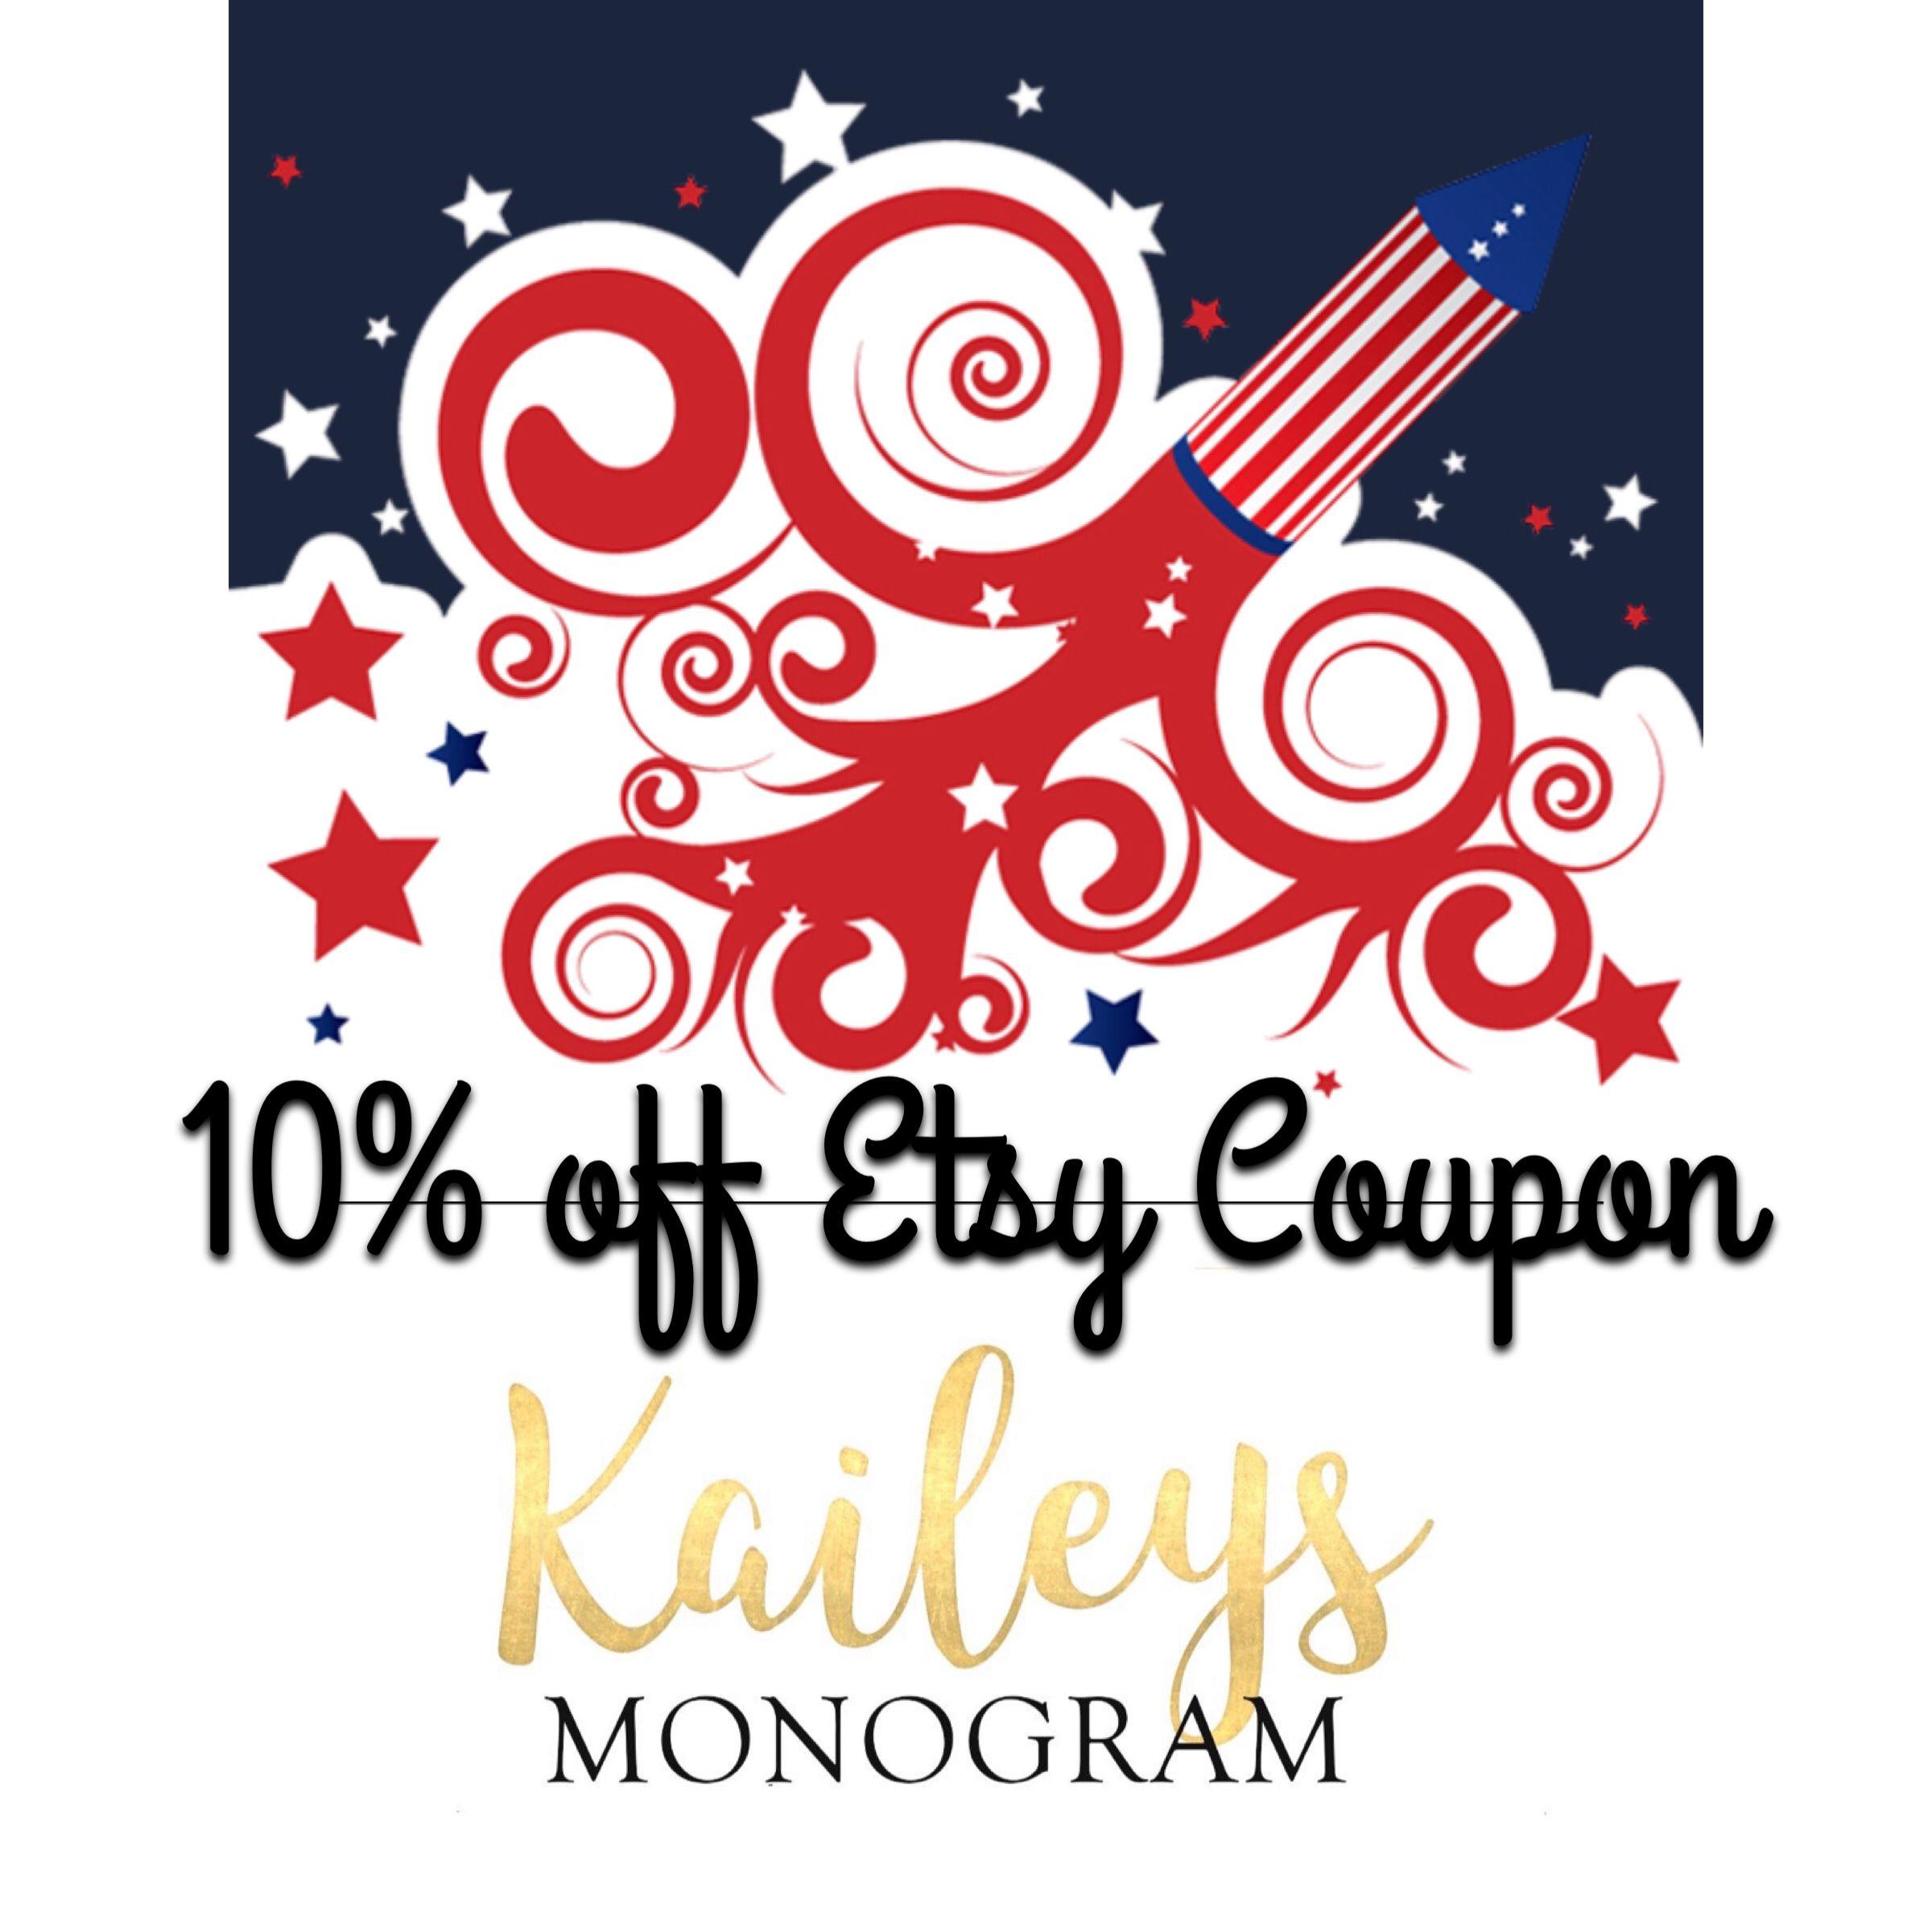 Pin On Etsy Monogram Gifts Kaileys Monogram Shop